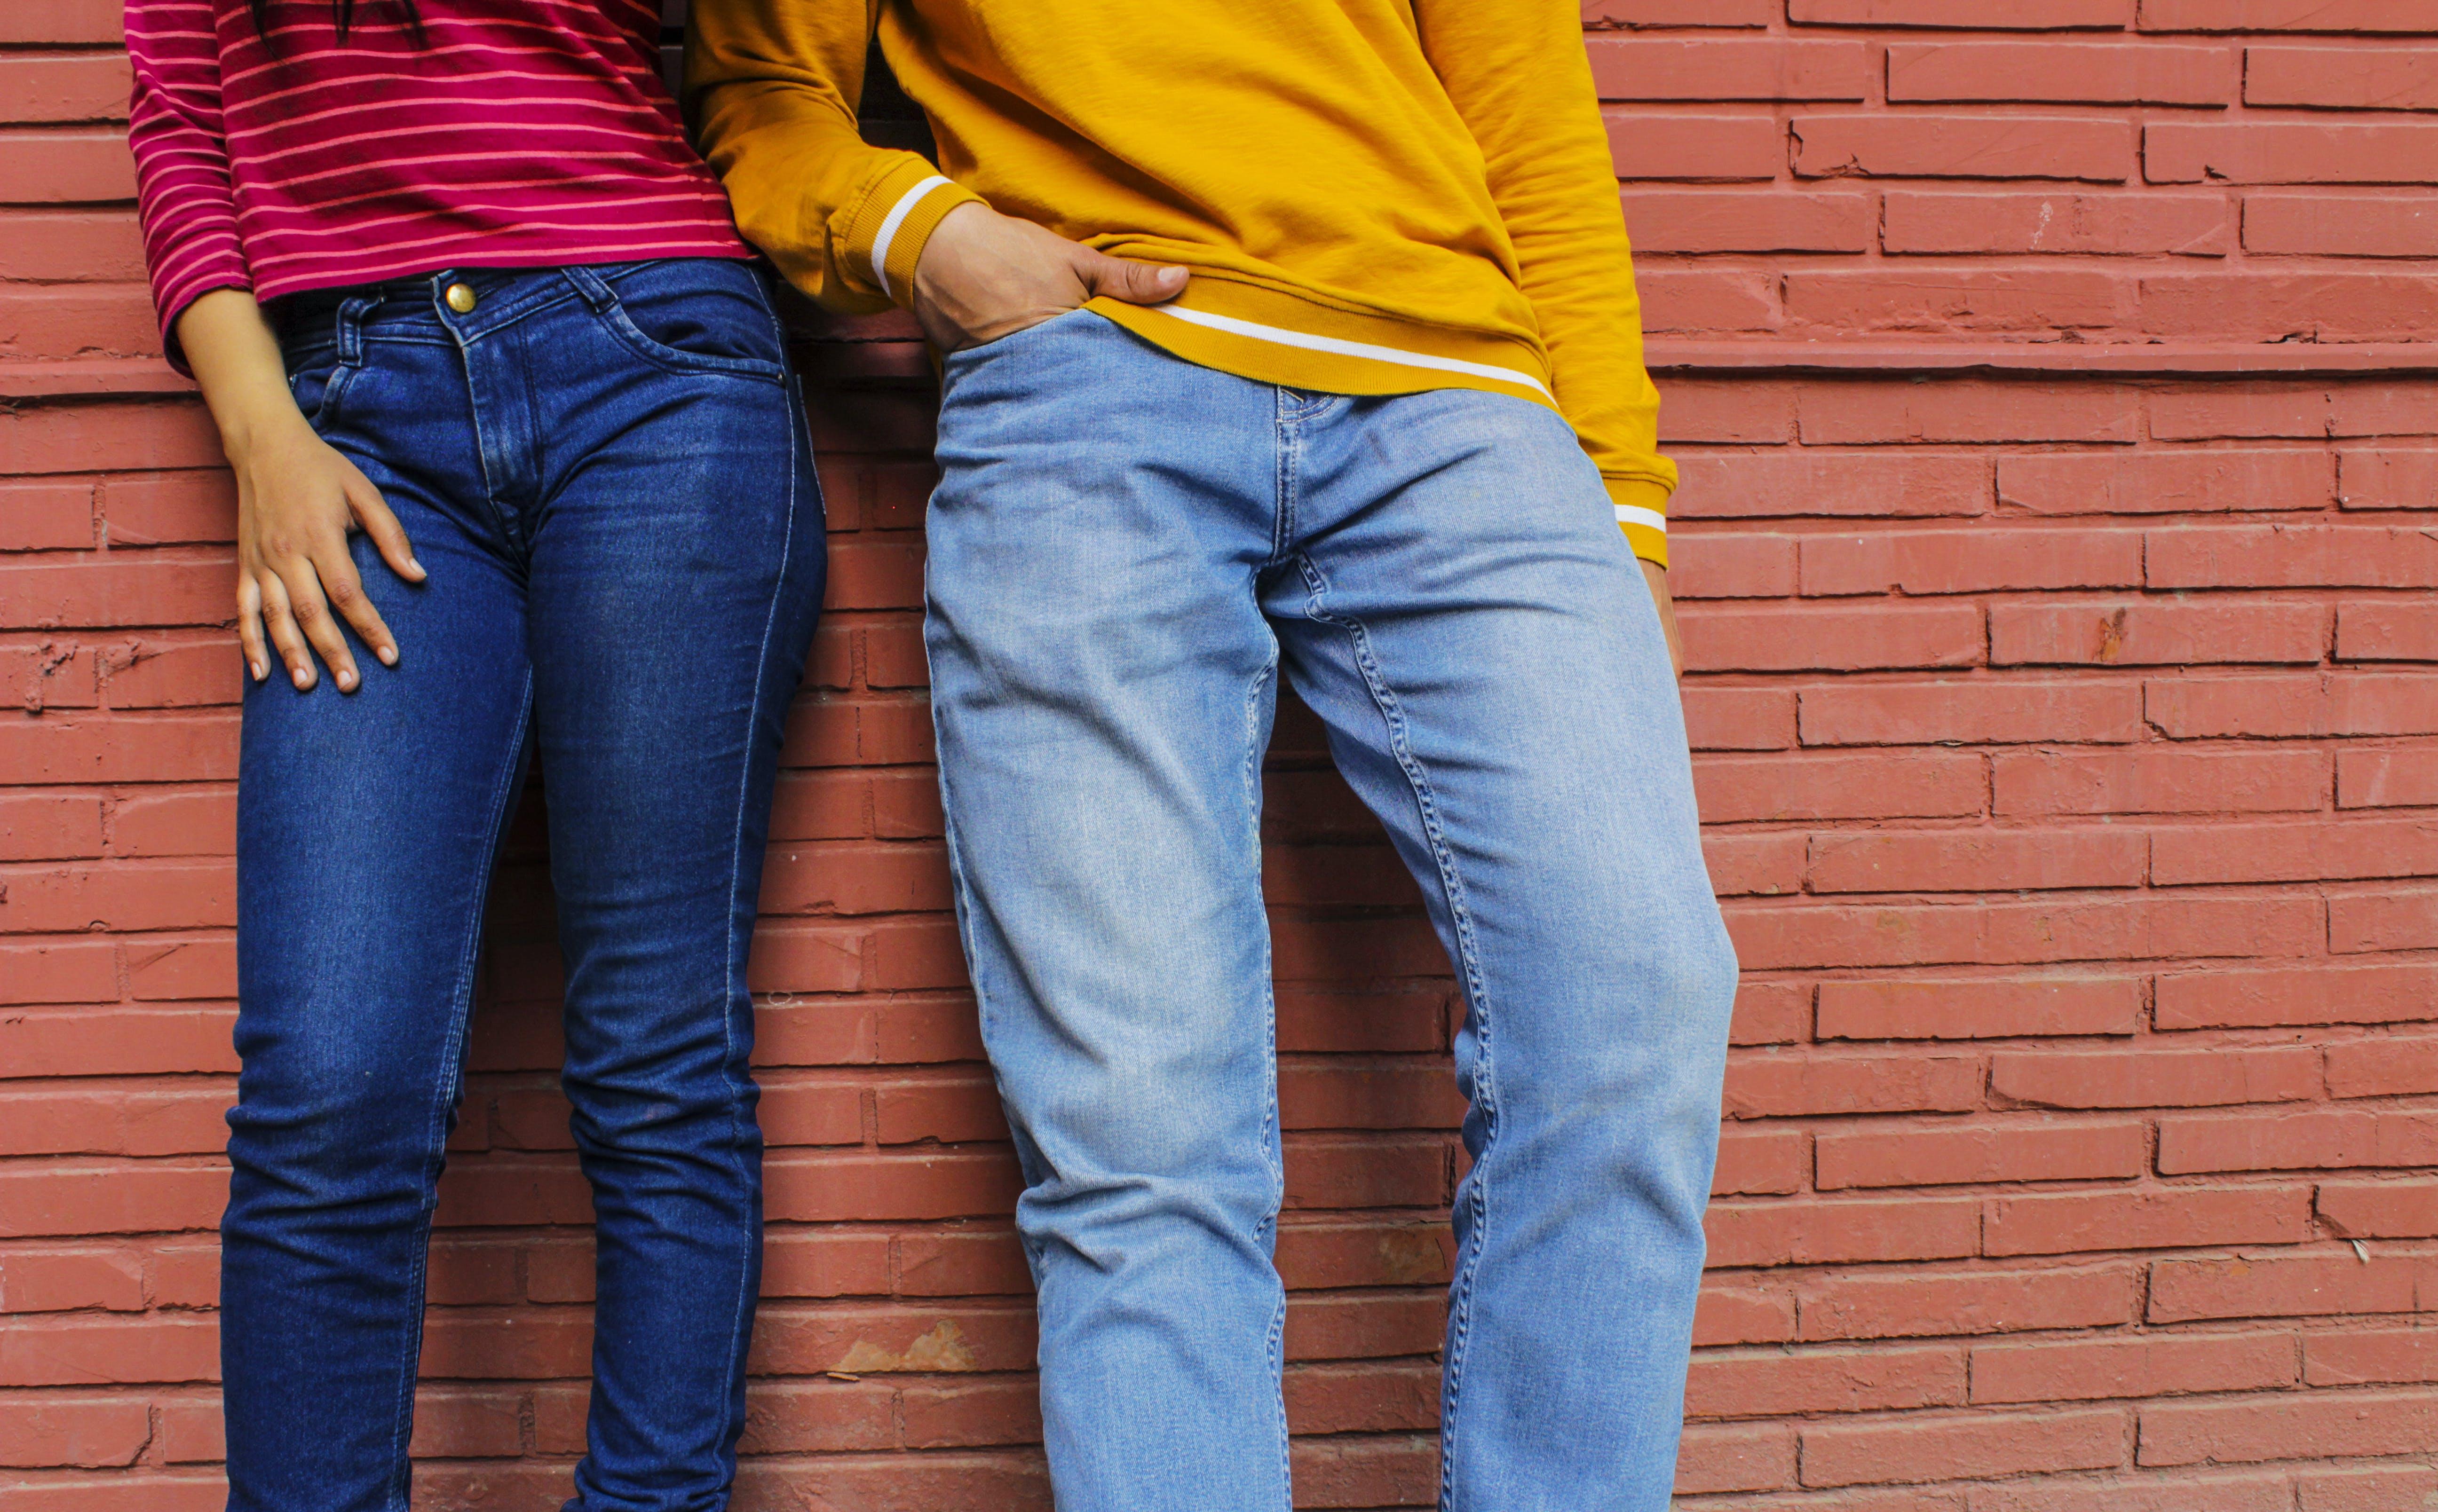 Kostenloses Stock Foto zu blaue jeans, bunt, denim, denim jeans